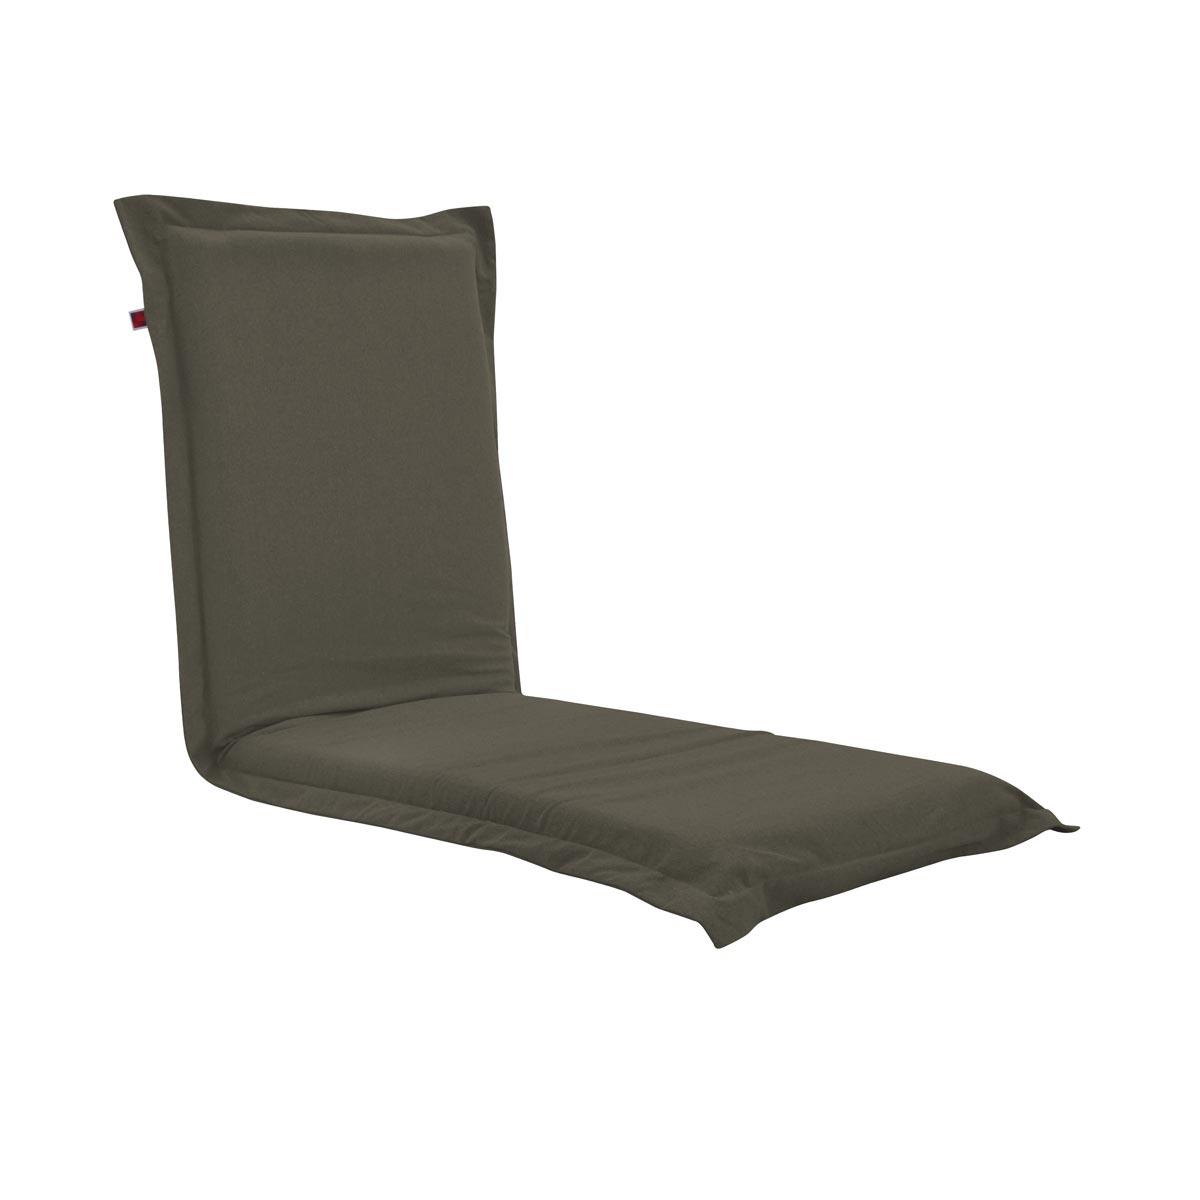 Pufe ClicClac Uno Lounge Tecido Ecolona Caqui 02 03a